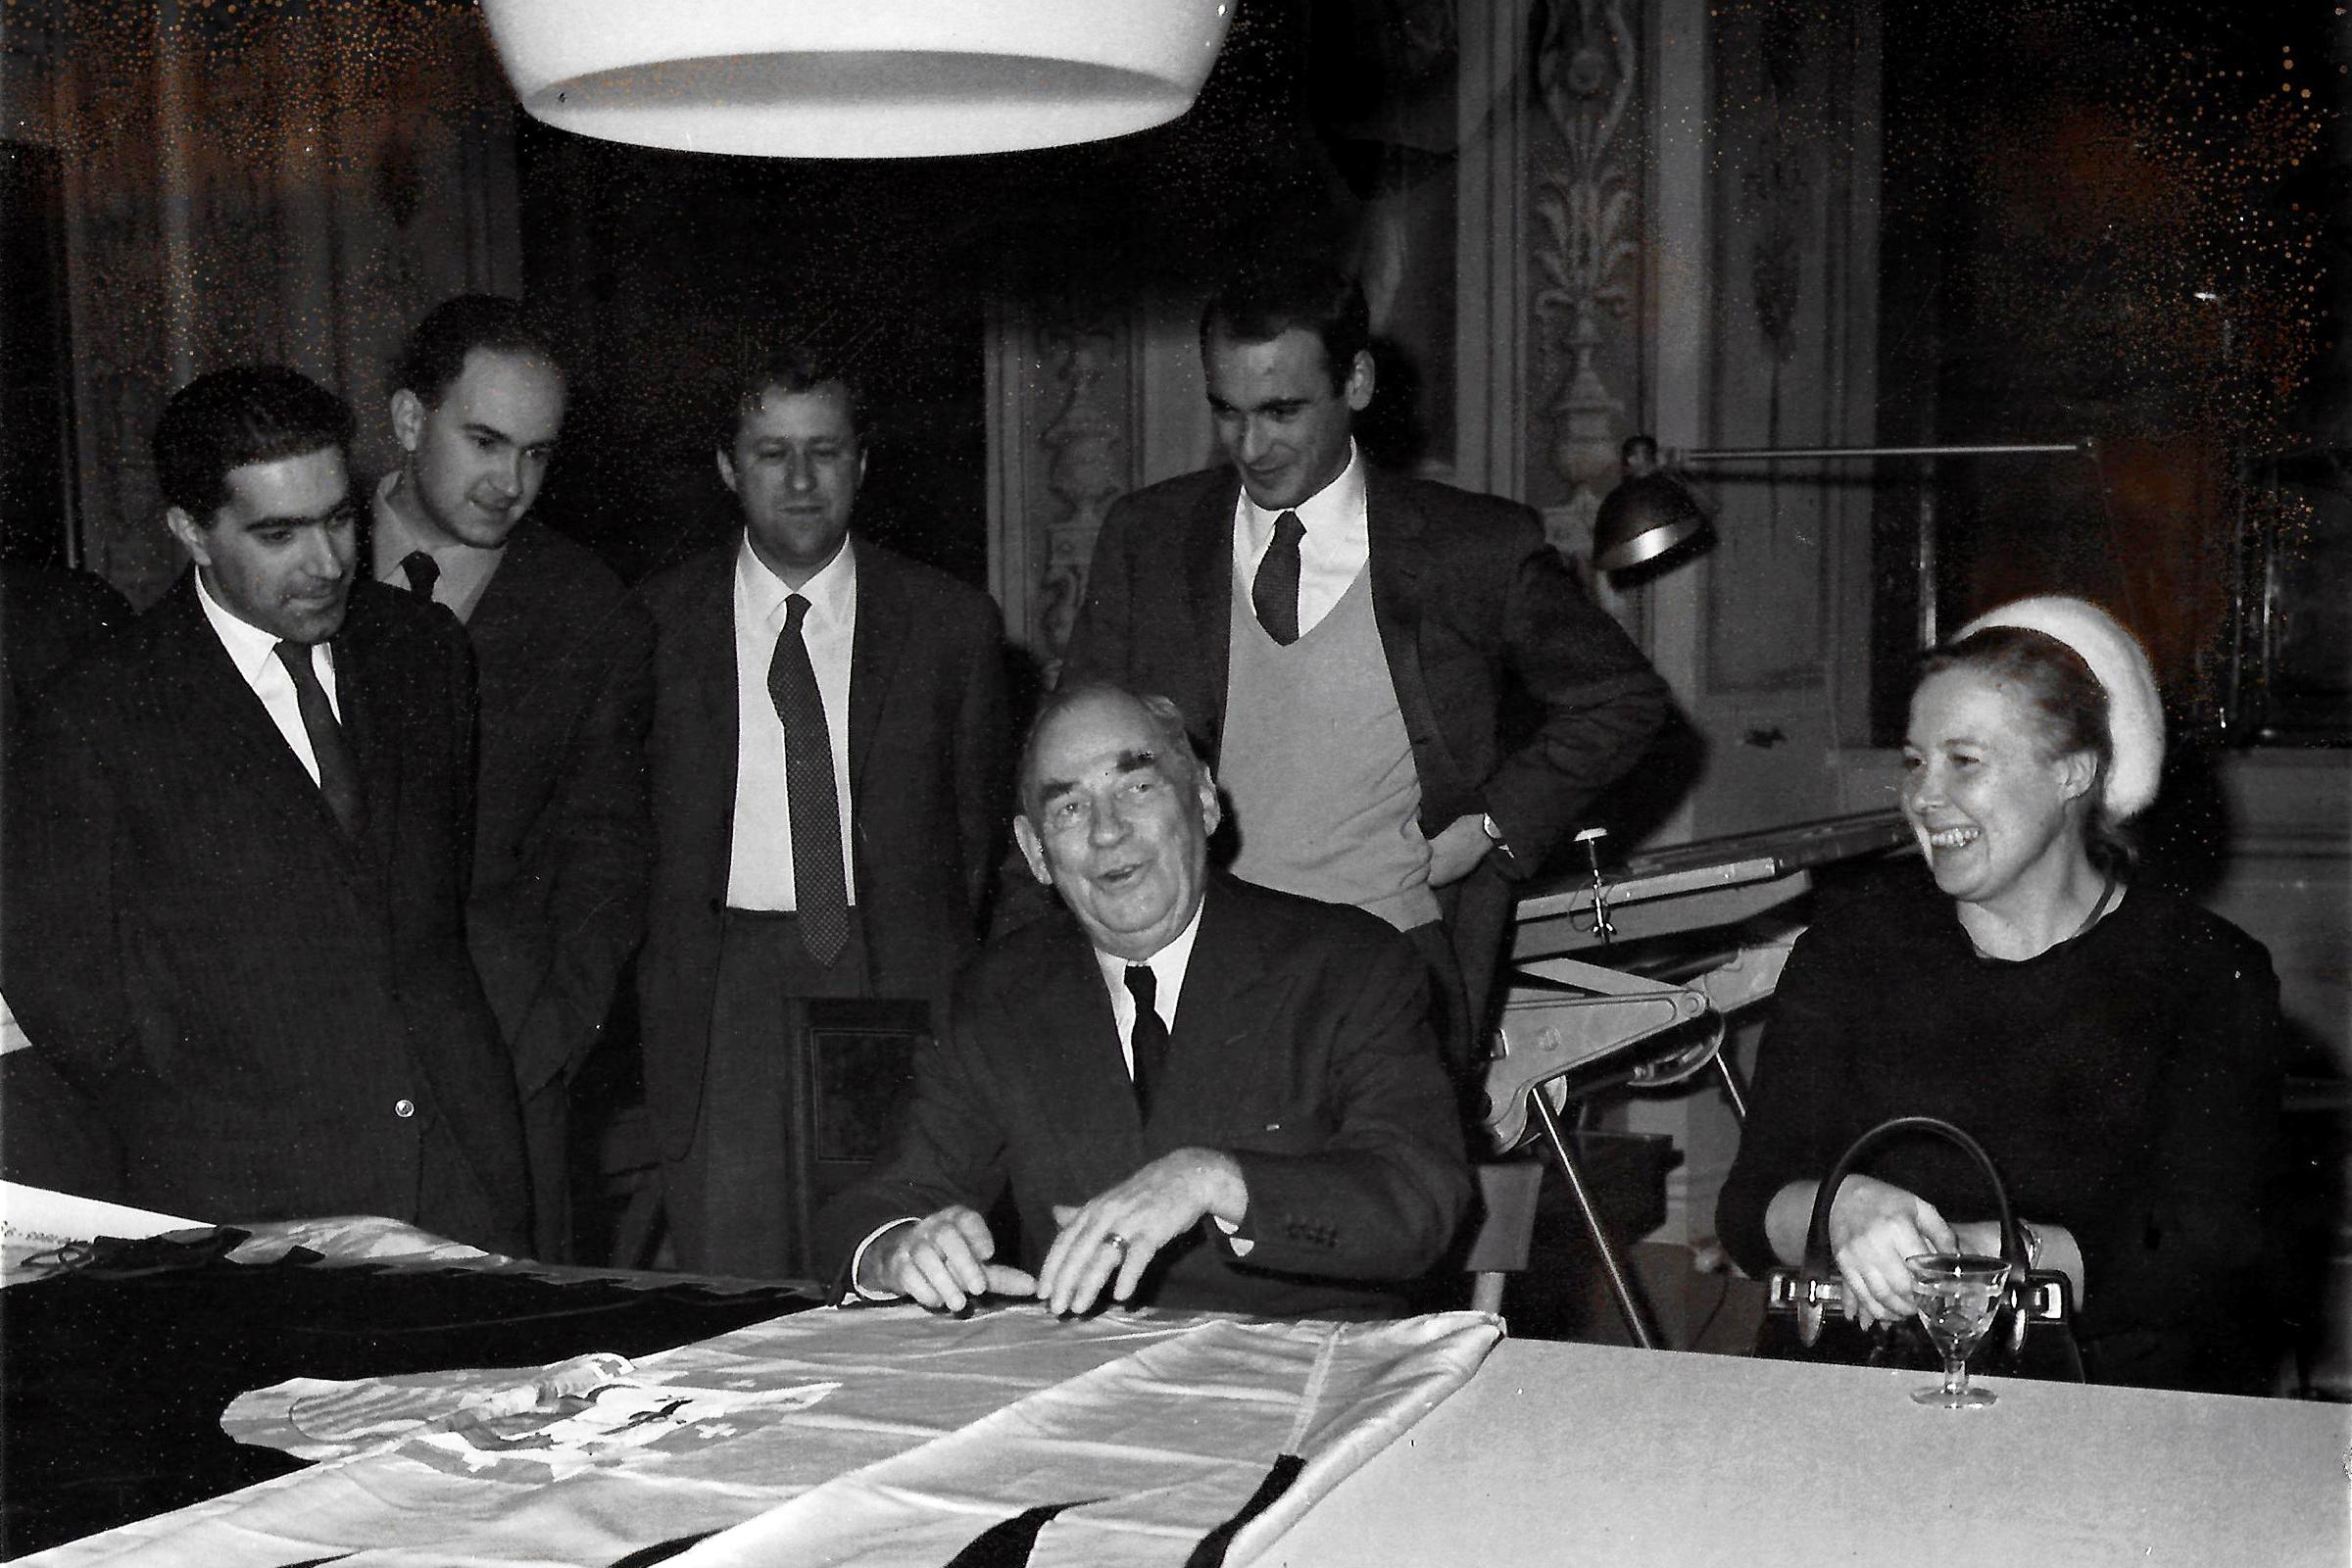 Giovanni Barsacchi di / from STUDIO Y  con /  with  Alvar Aalto, Elissa Aalto, Fabio Parigi, Alessandro Biagi, Augusto Mazzini, al suo studio a Siena /  at his office in Siena  (1966)